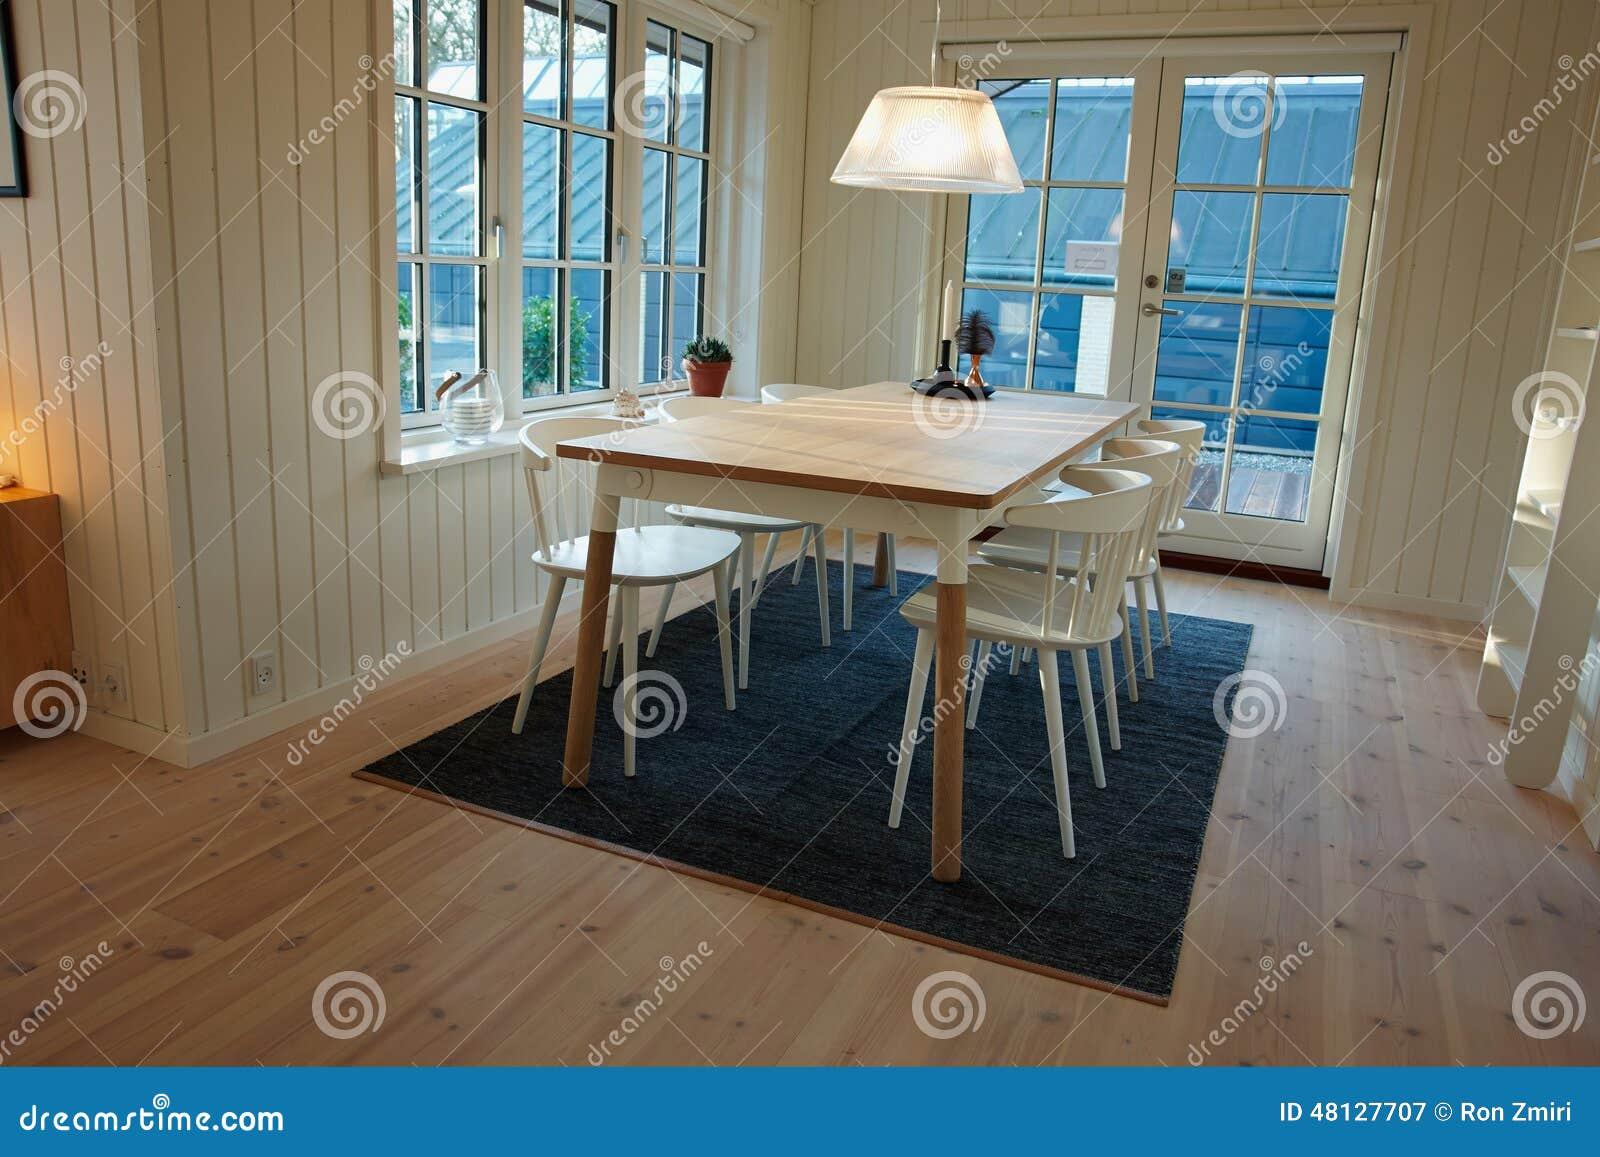 Modern Dining Room Danish Scandinavian Interior Design Stock Image ...